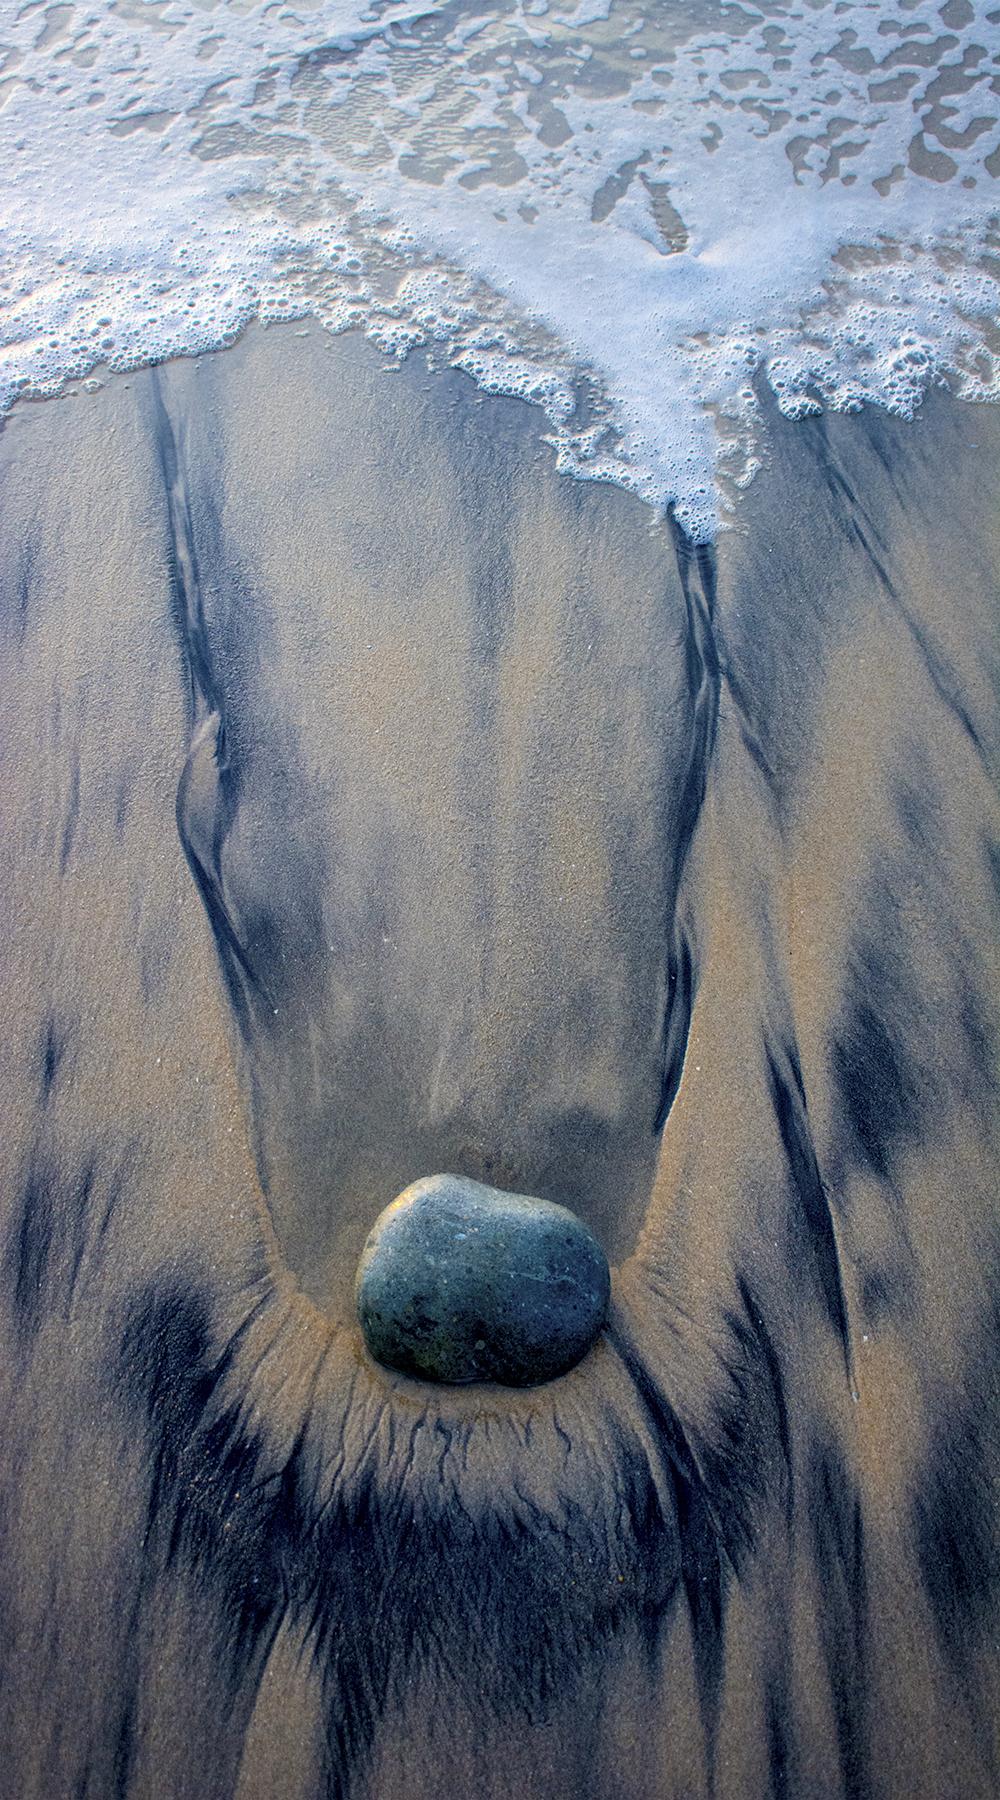 willa_davis_37-minutes-of-Mujo_rock-surf-nest_08.jpg